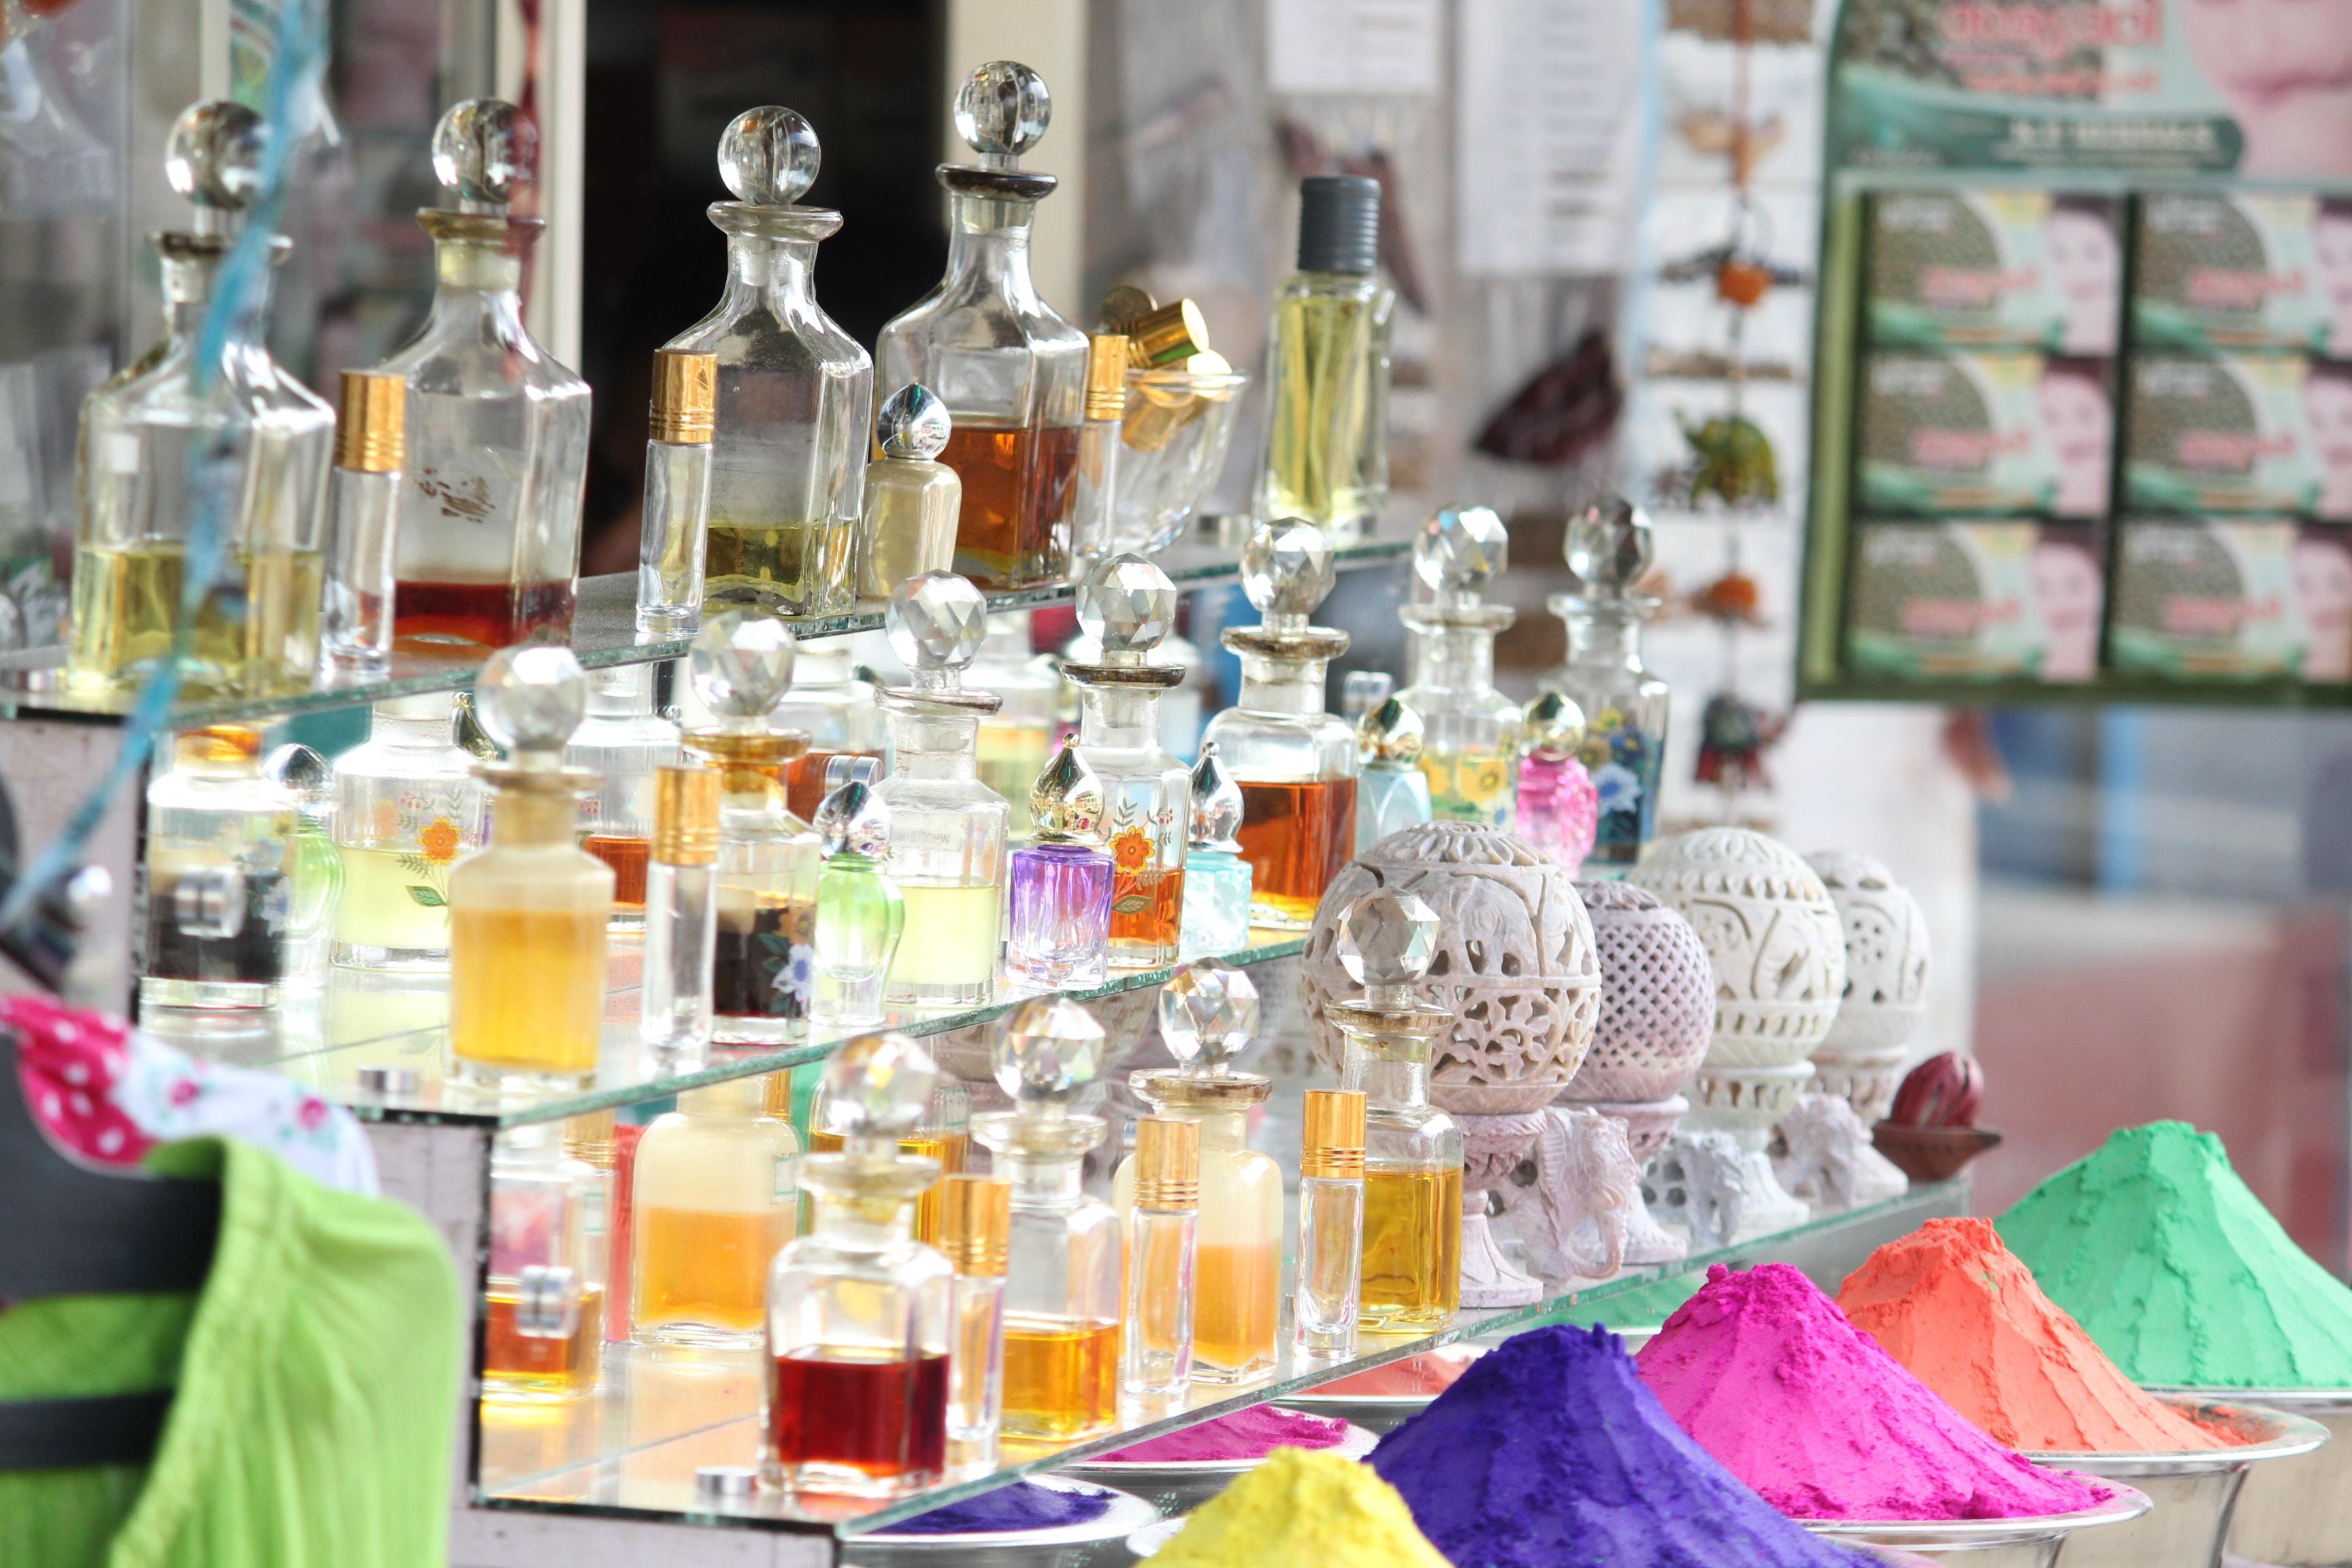 How to Apply Perfume?